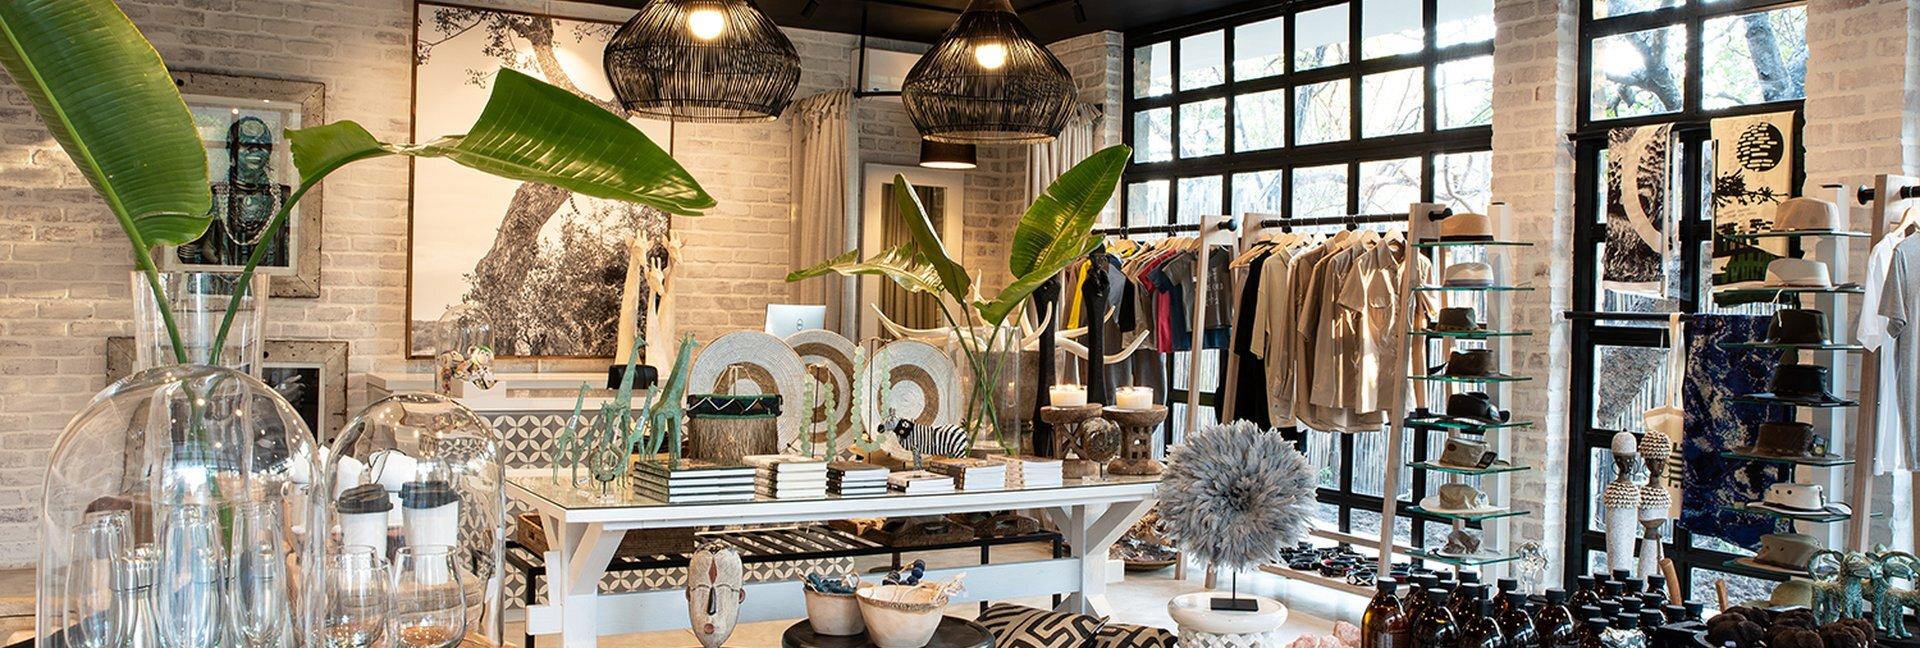 living_boutique.jpg__1920x648_q85_crop_subsampling-2_upscale.jpg